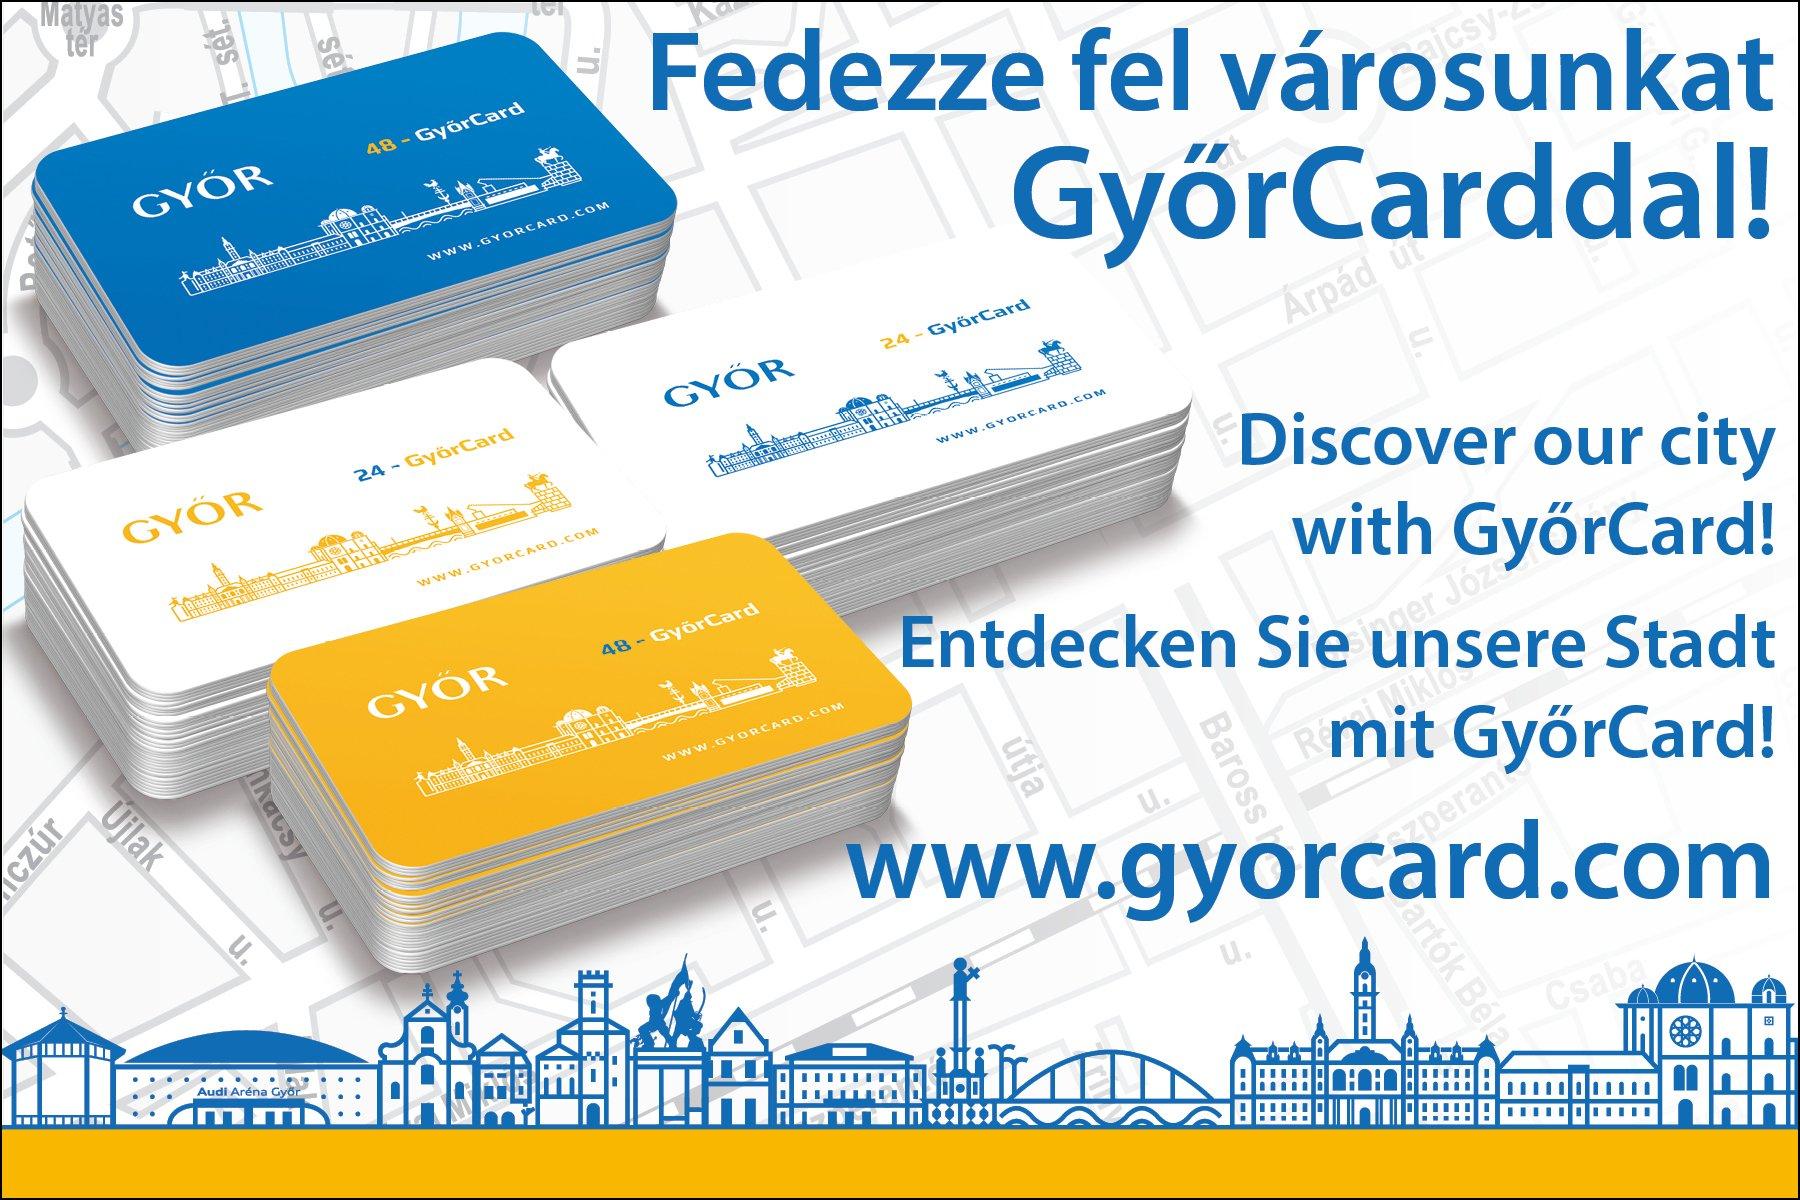 Gyorcard_18-02-27_600x400px_Facebook